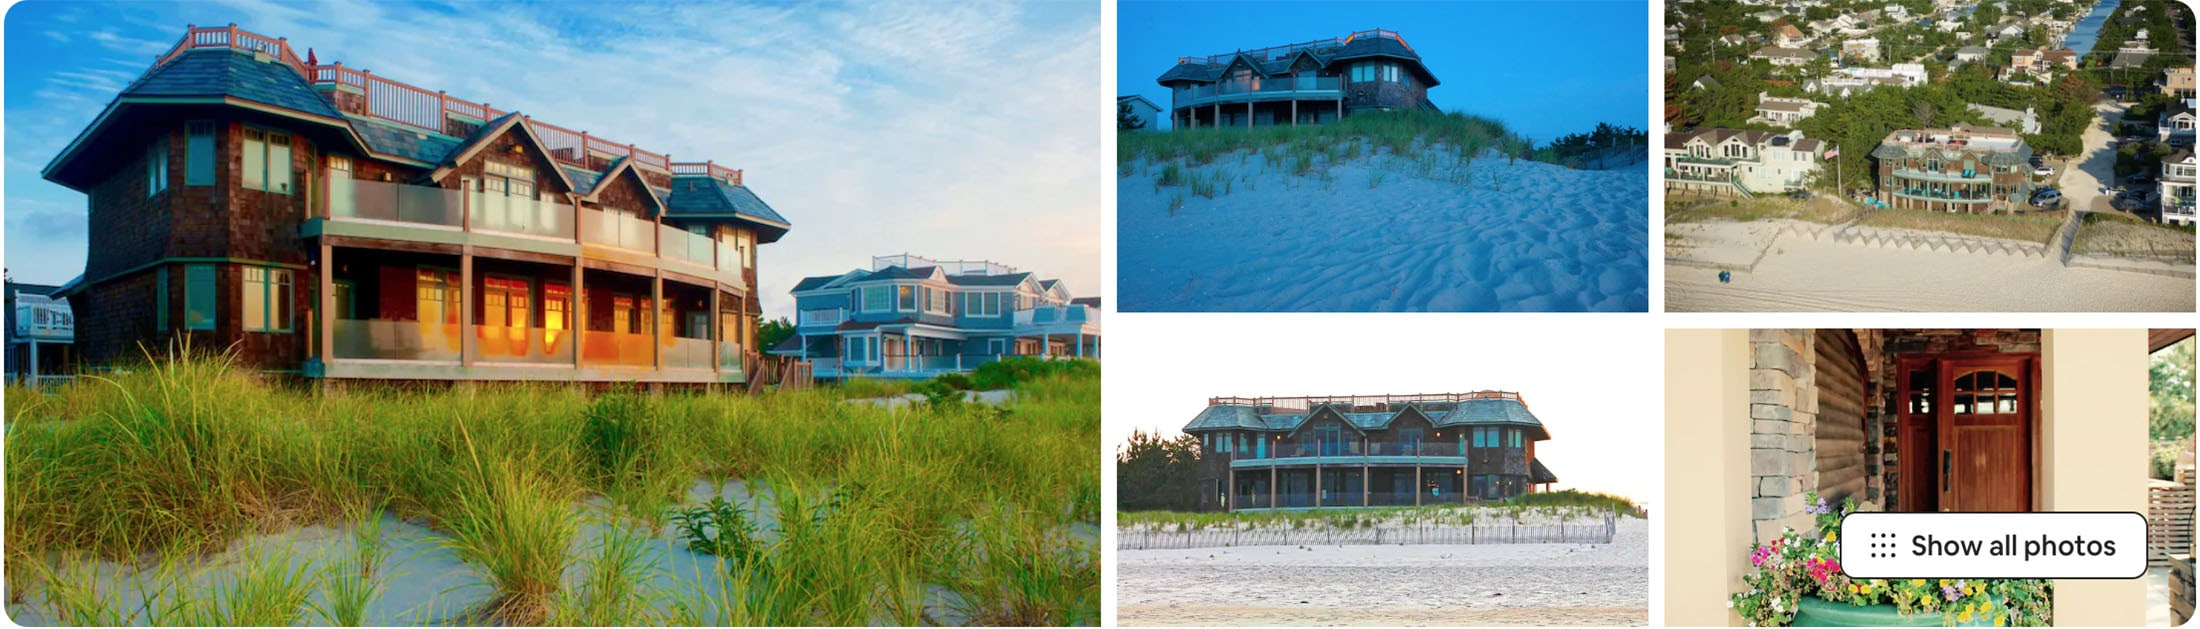 Long Beach Township Airbnb wedding venue